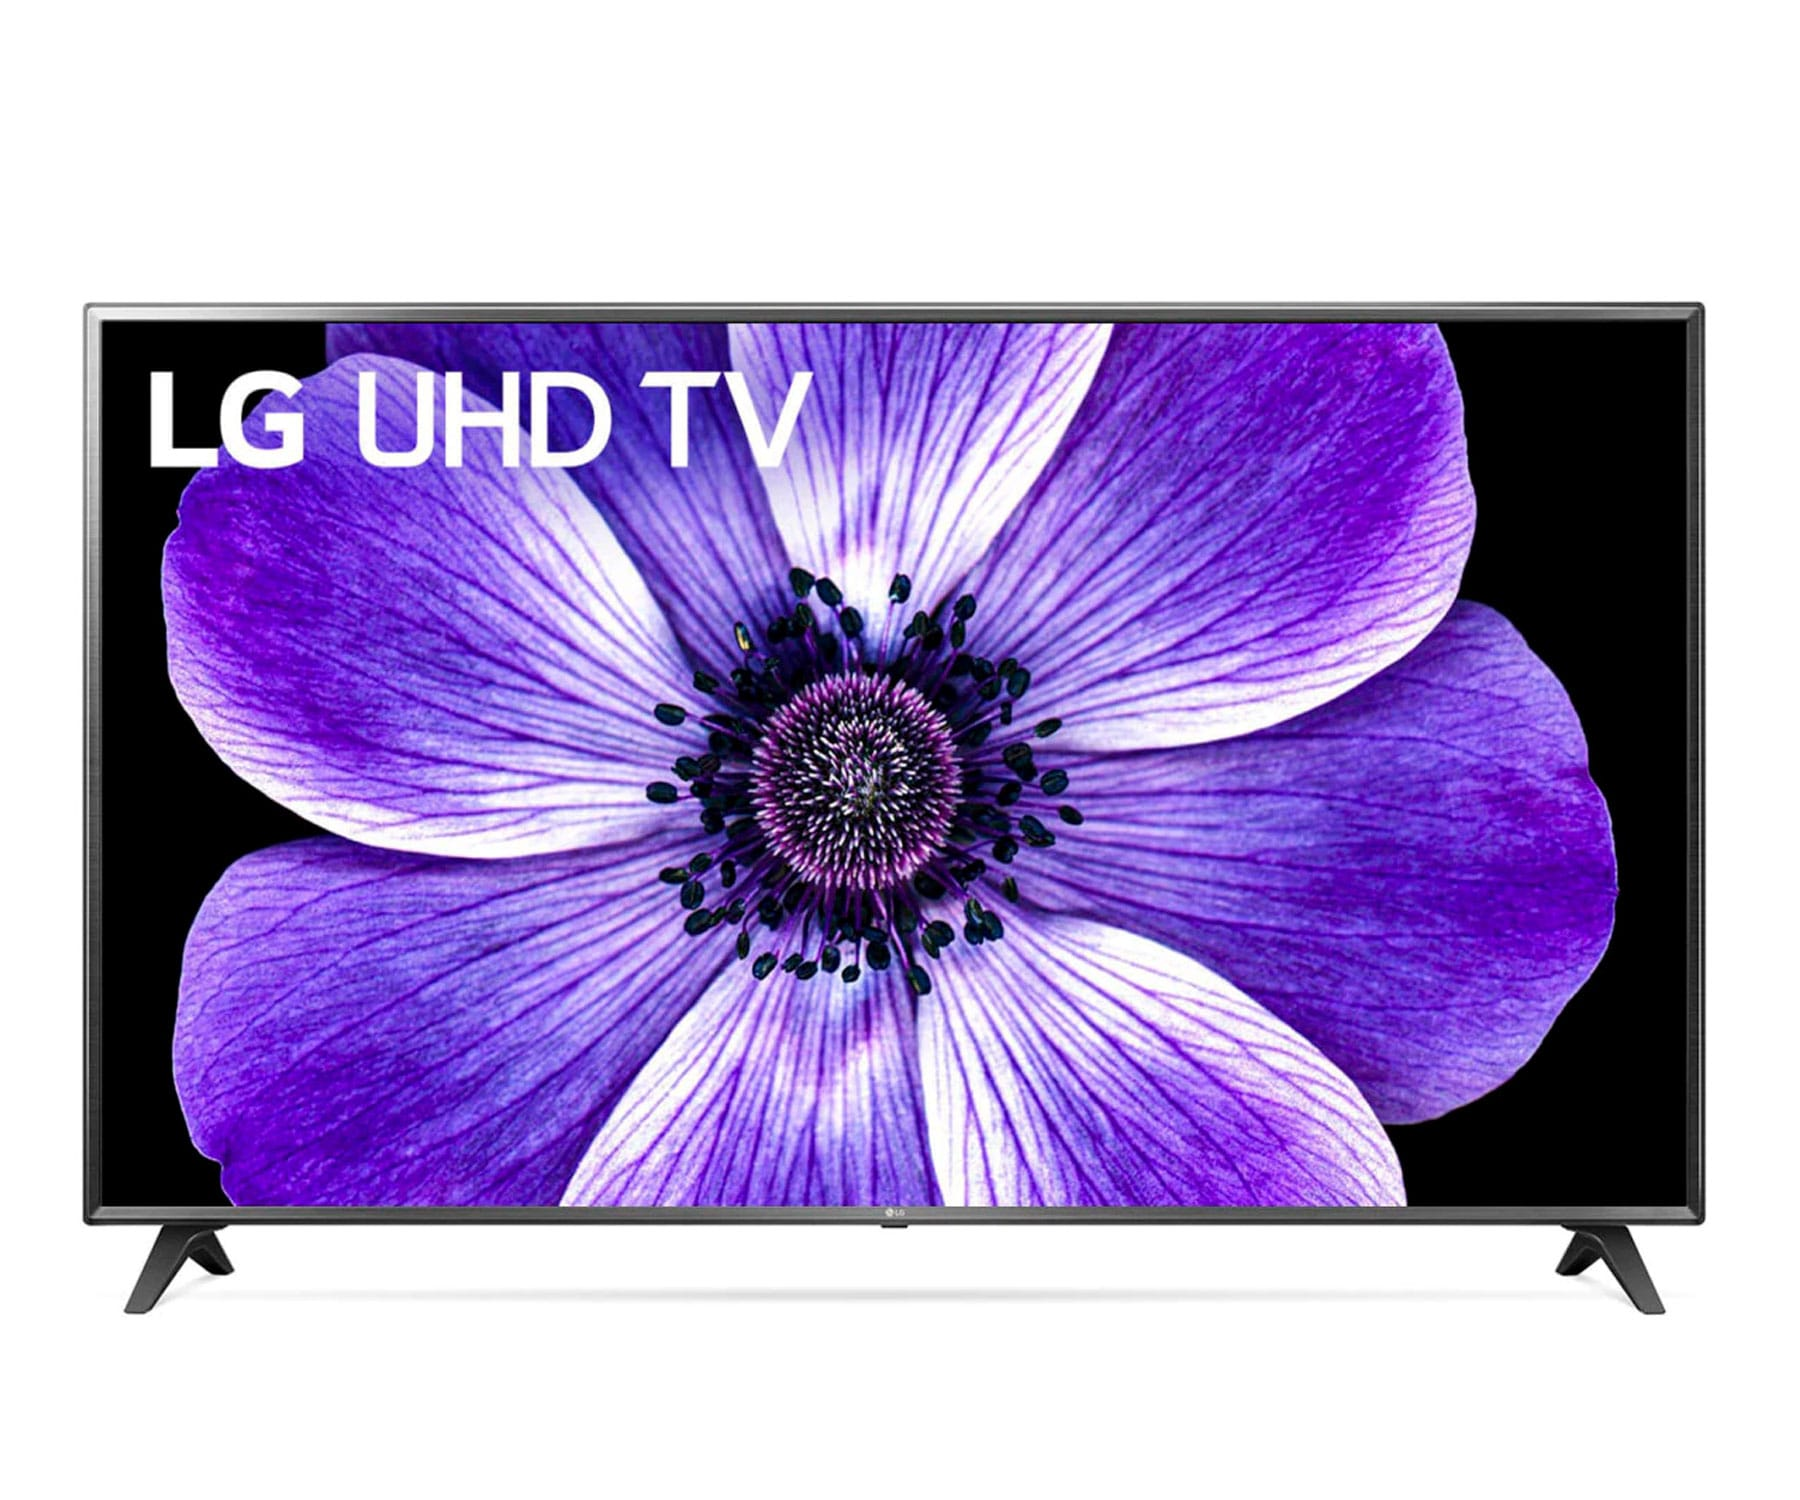 LG 75UN70706LD TELEVISOR 75'' LED UHD 4K SMART TV WEBOS 5.0 WIFI HDMI BLUETOOTH